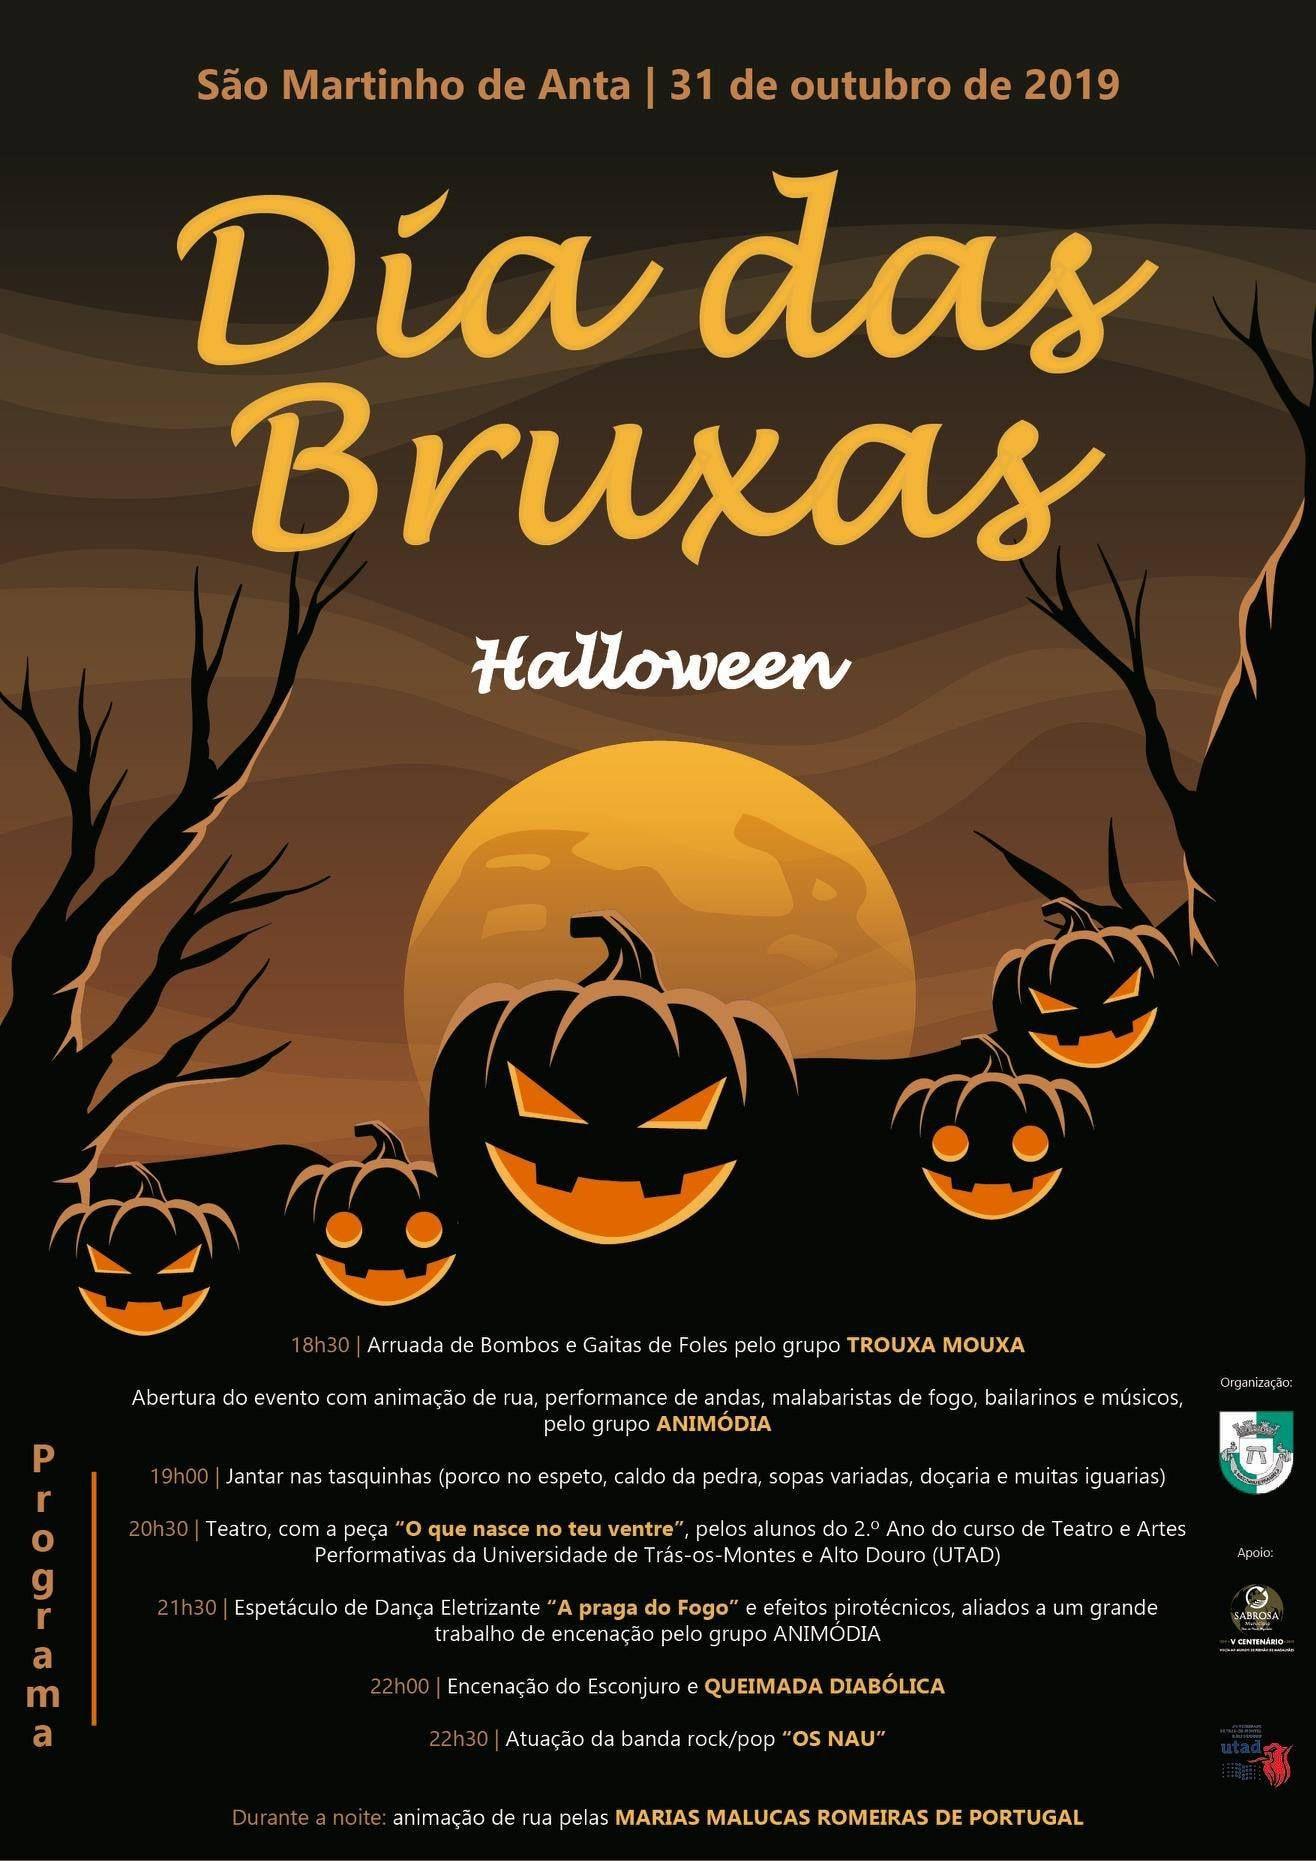 Os Destinos Mais Terrorificos Para Celebrar O Halloween Dentro E